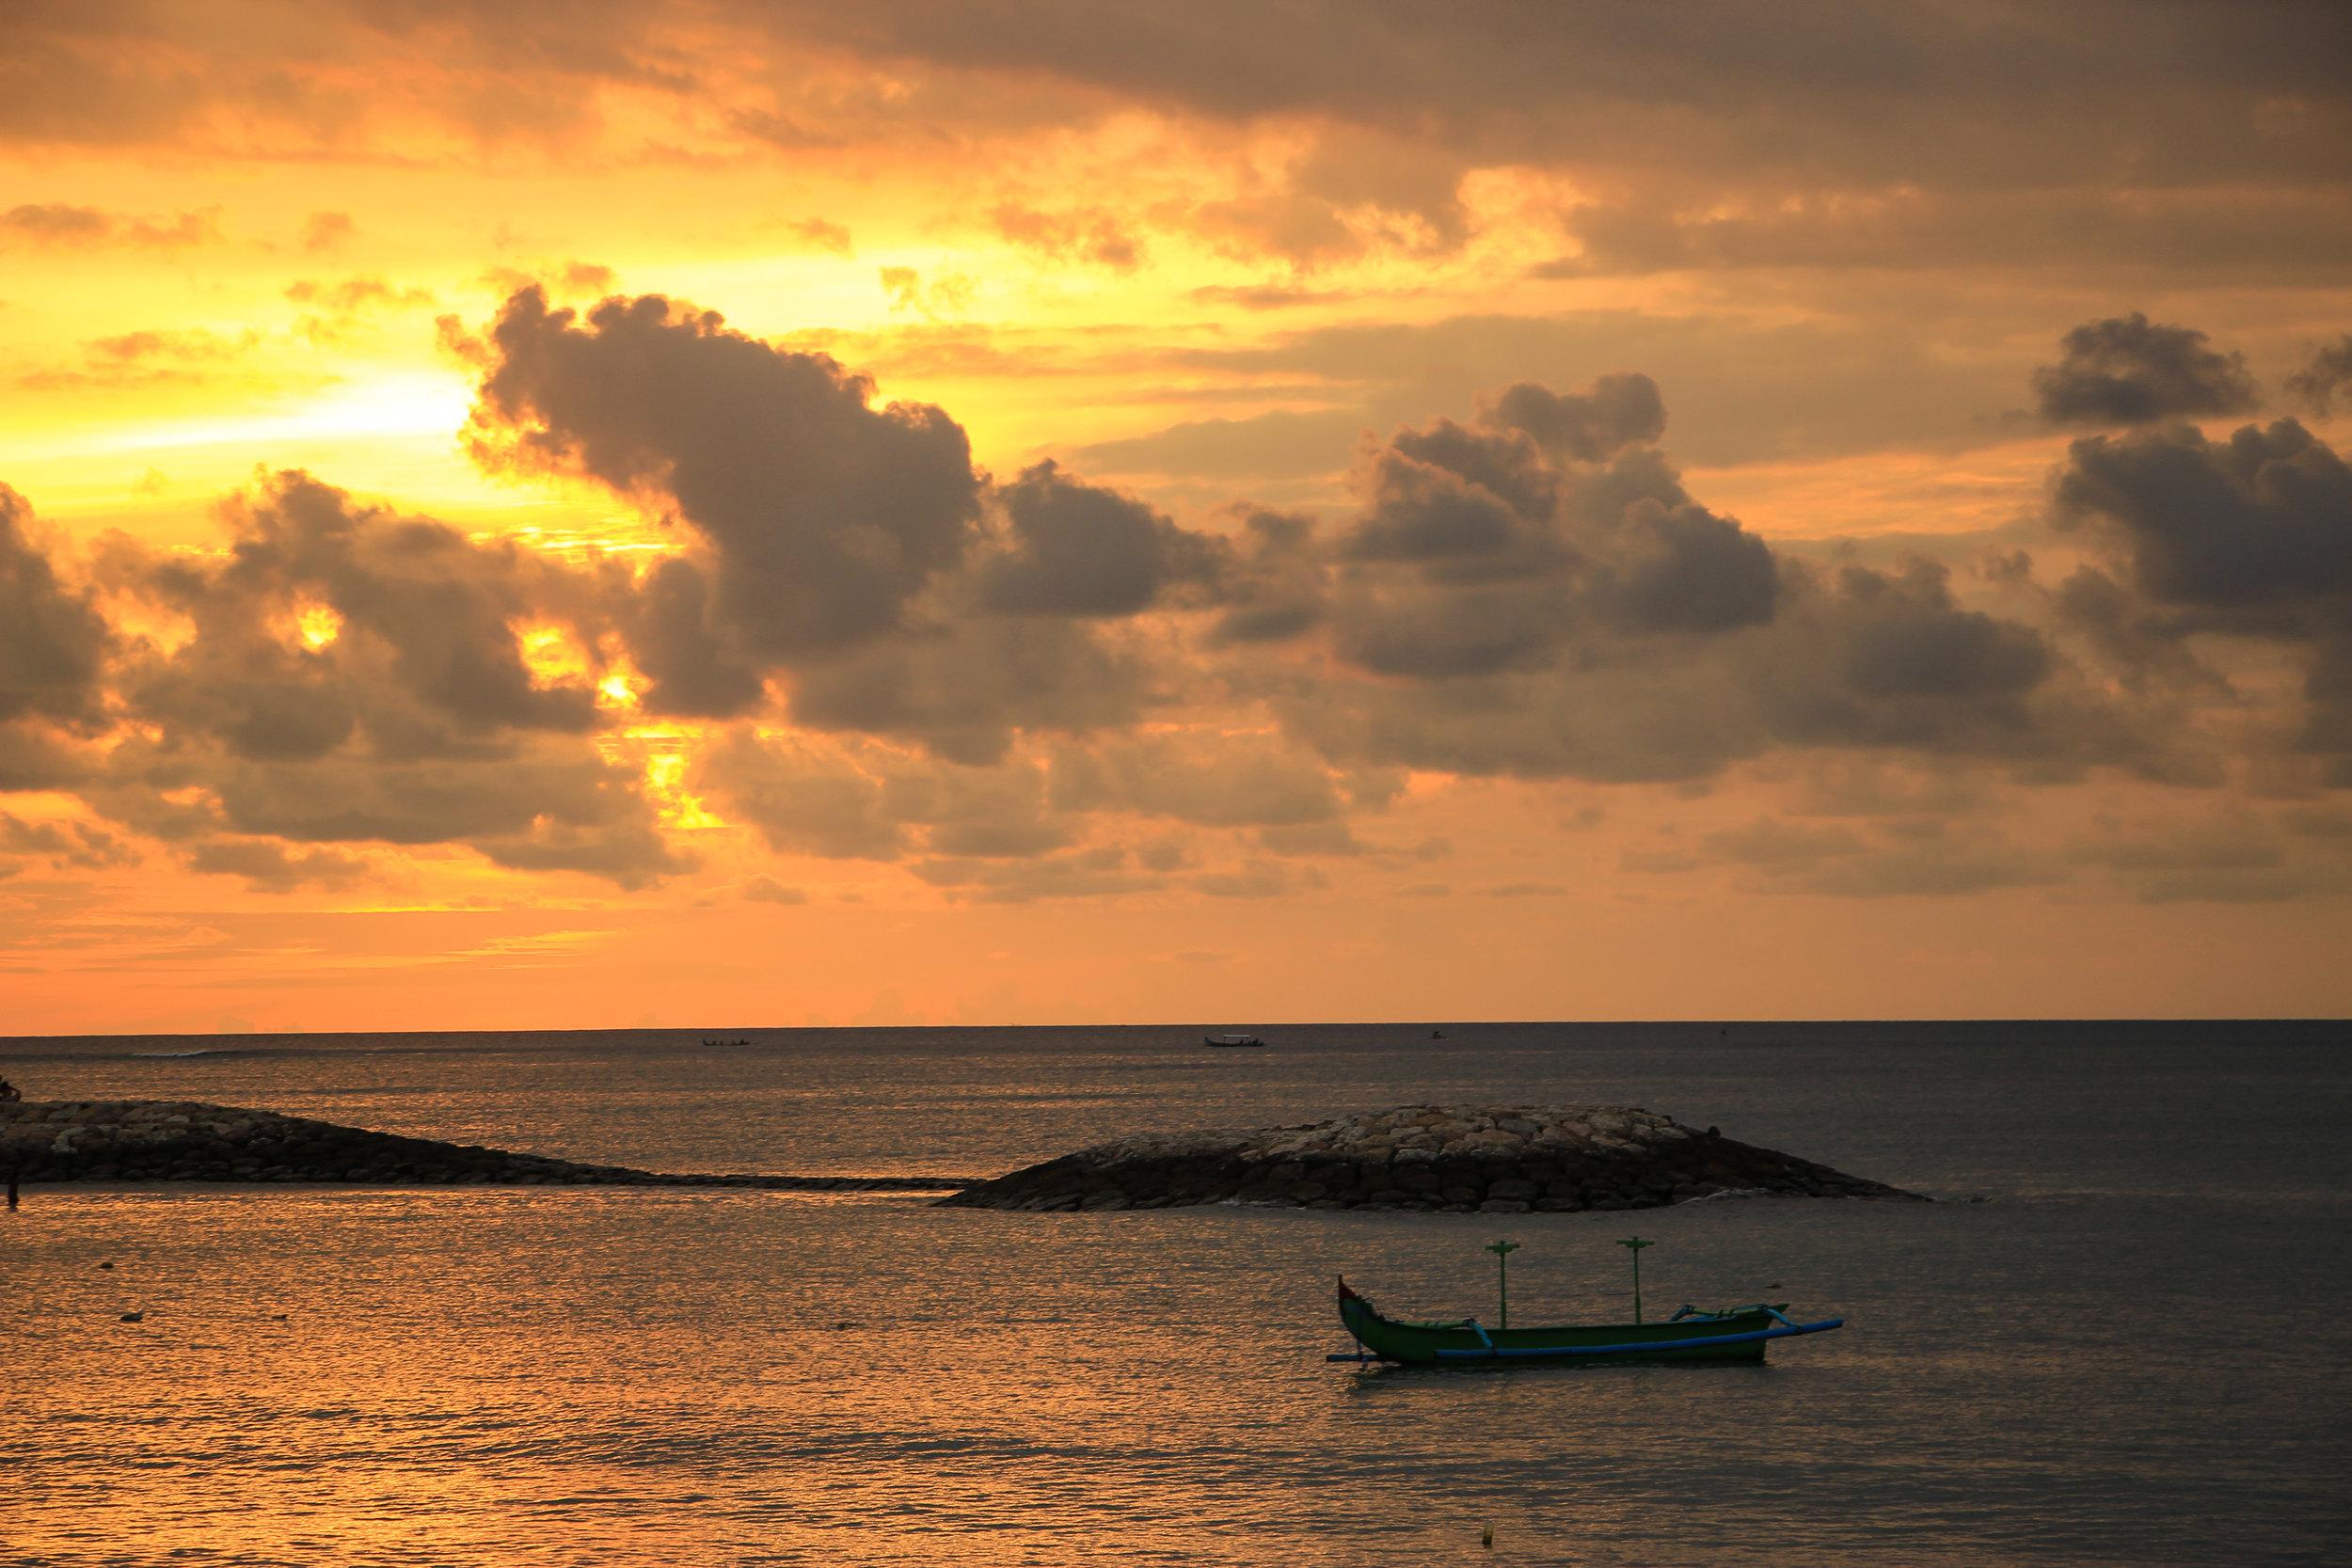 sunset, Sea, fishing boat, Bali, Indonesia, Asia | DoLessGetMoreDone.com |